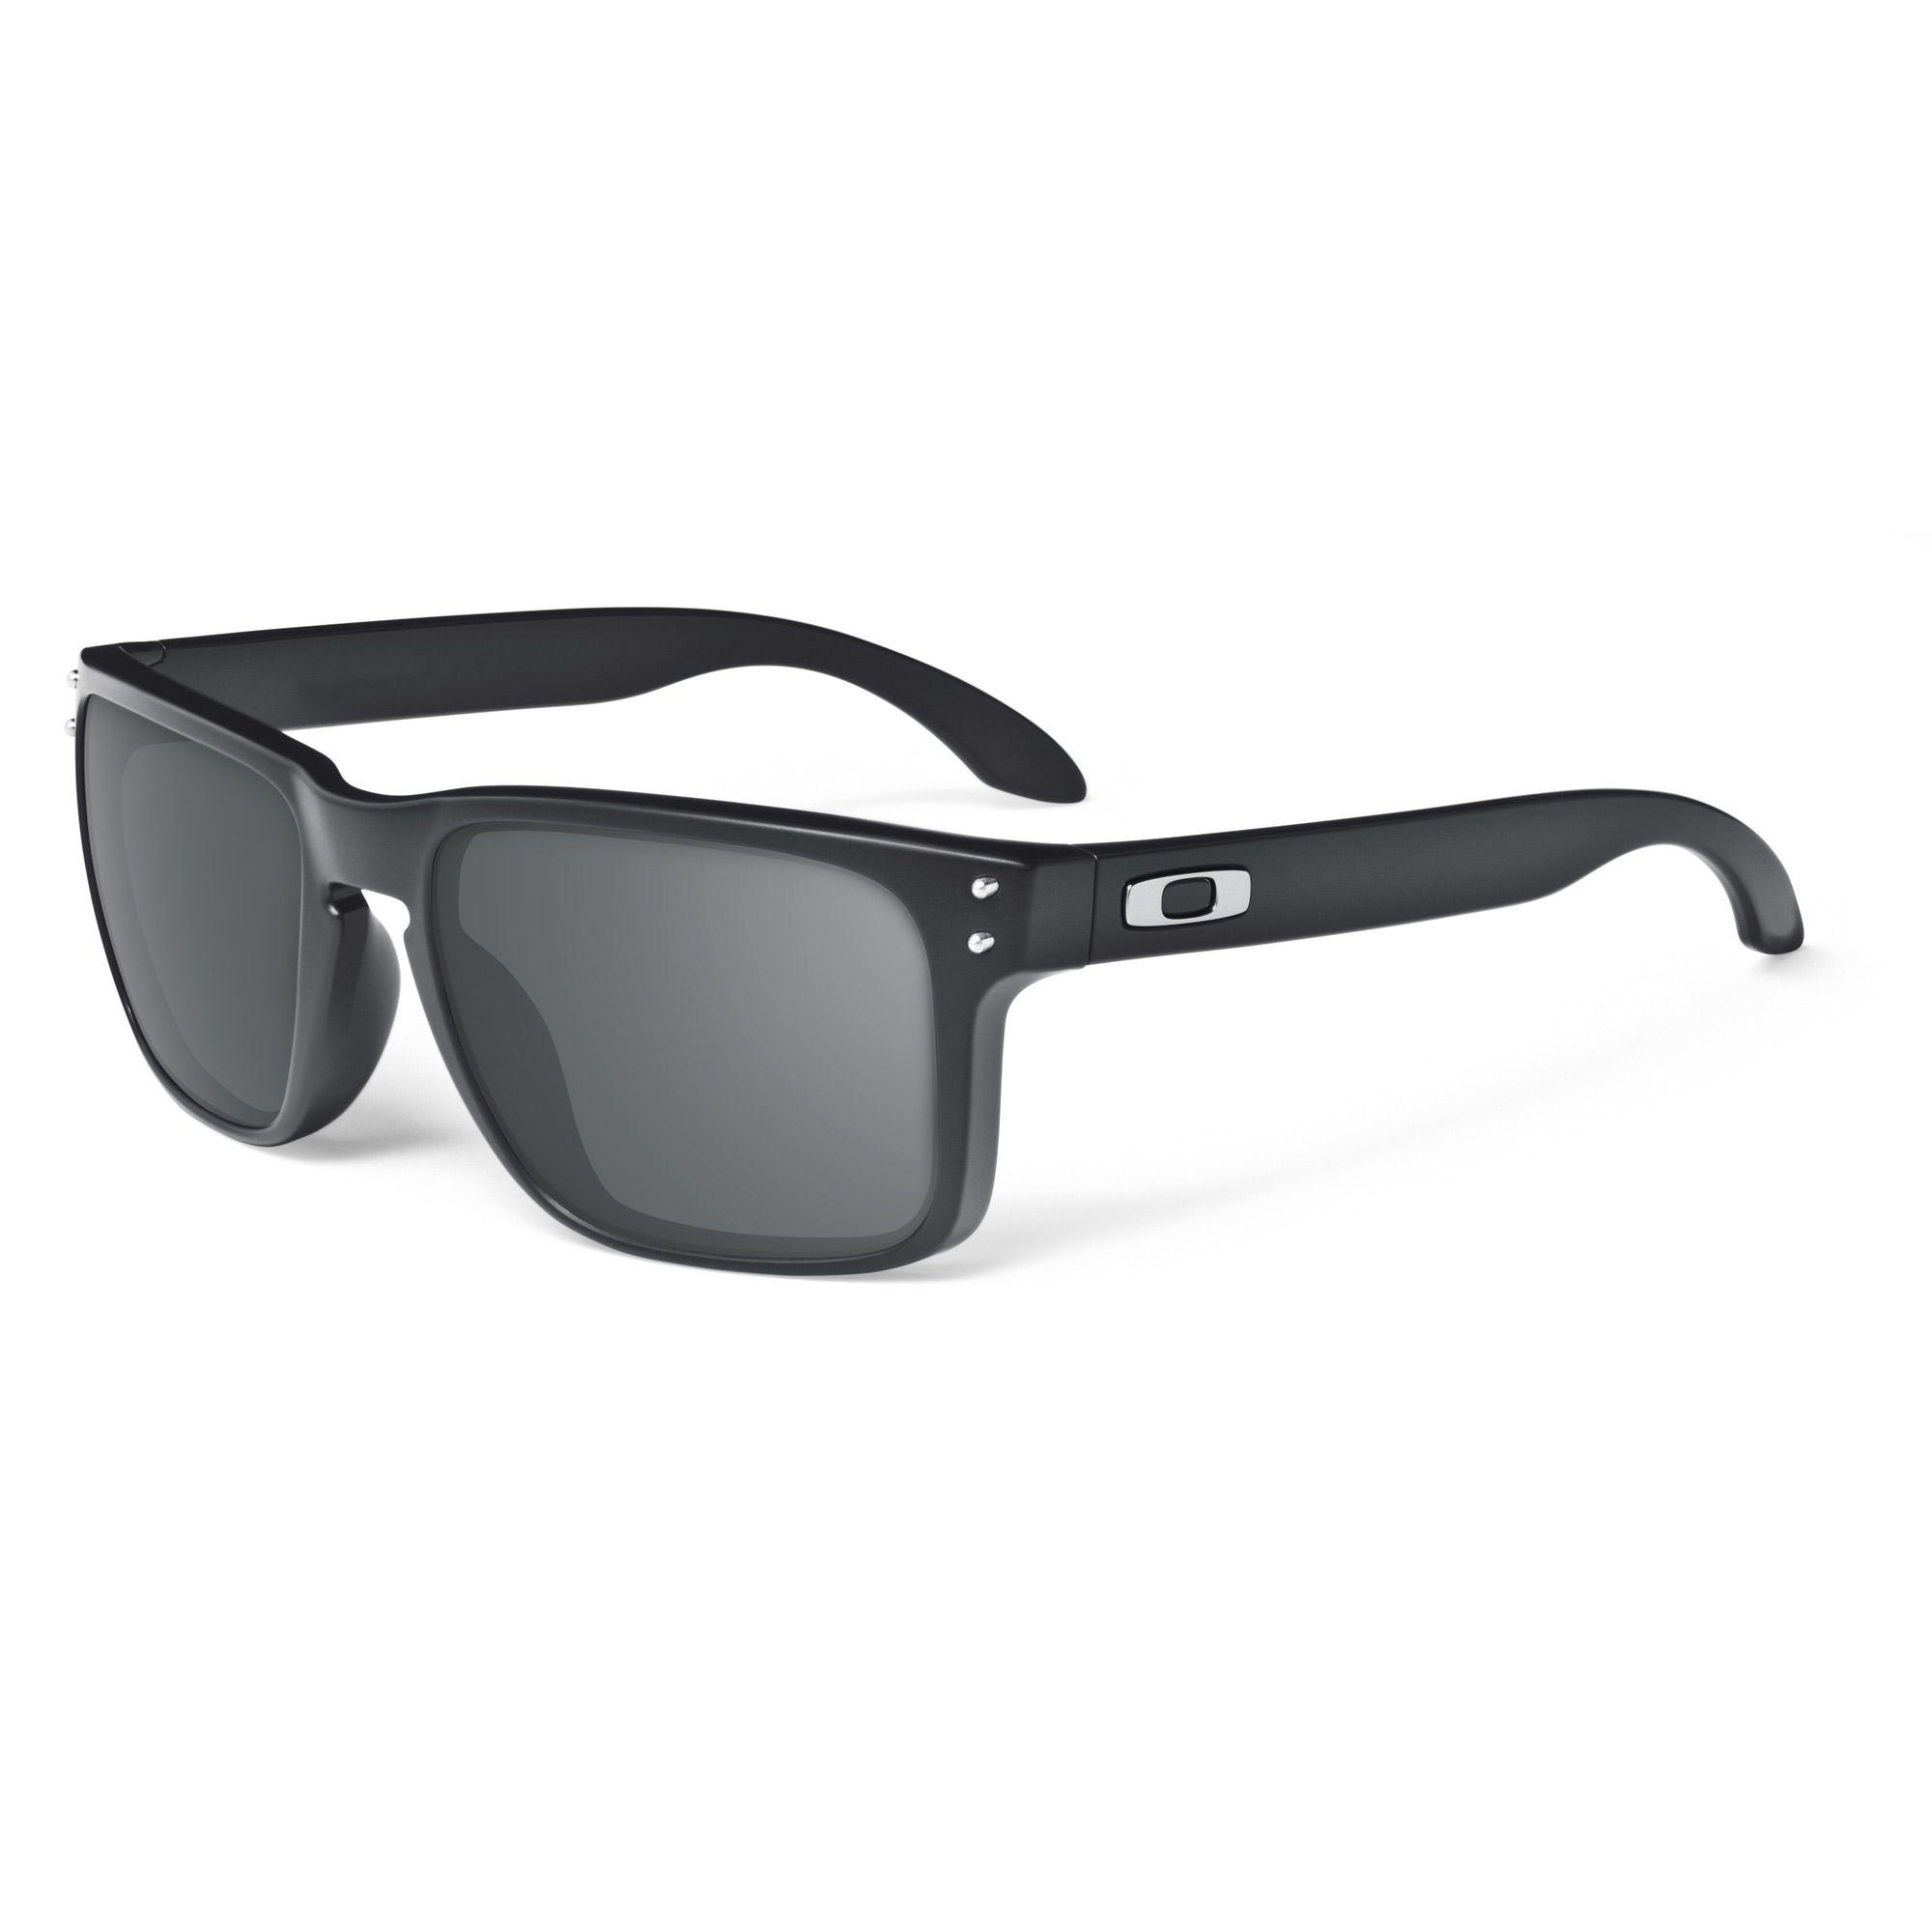 OAKLEY HOLBROOK RS. 5O25/ MADE IN USA Oakley sunglasses